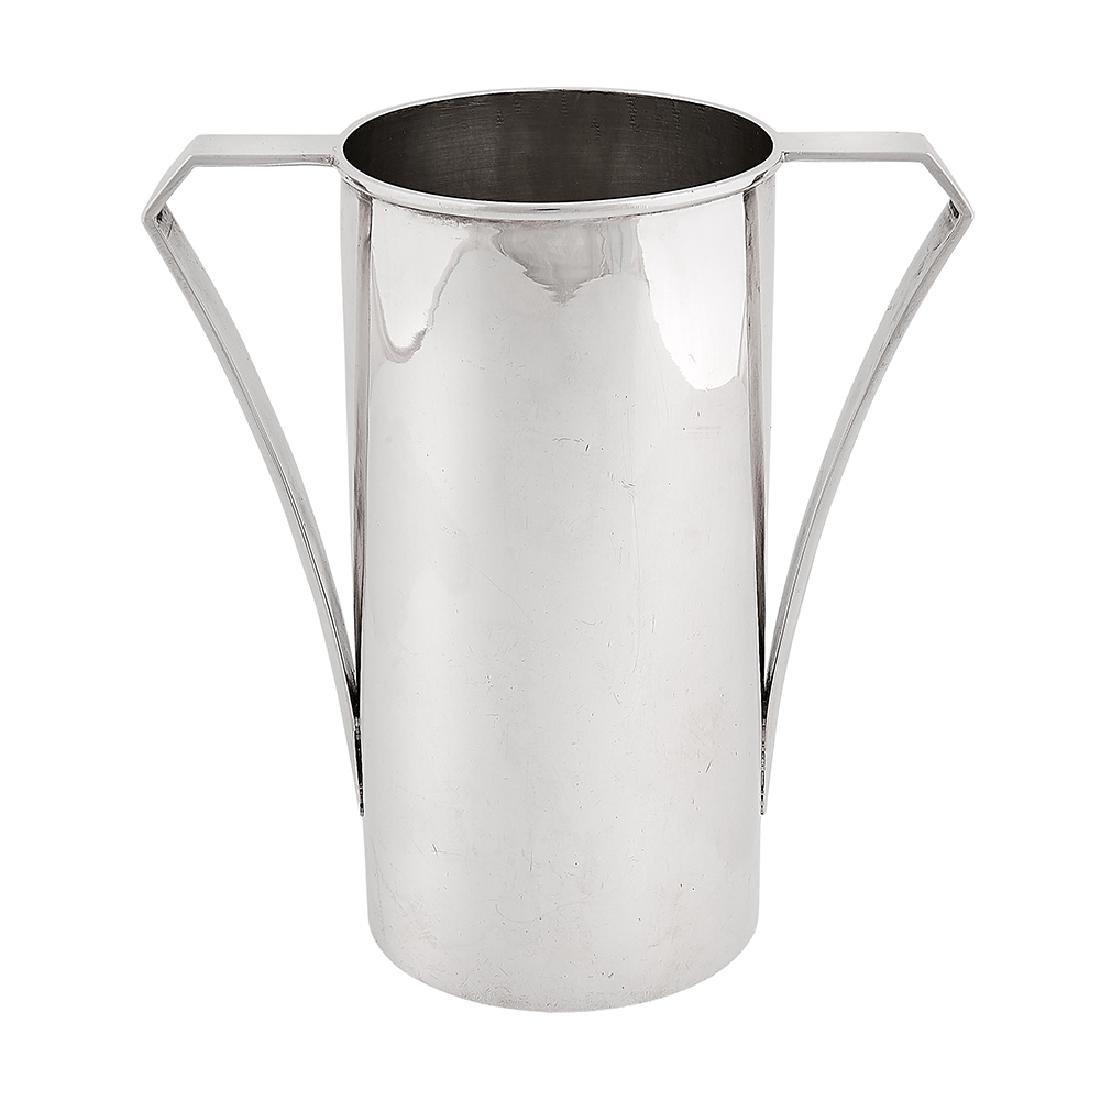 The Kalo Shop double-handled trophy form vase